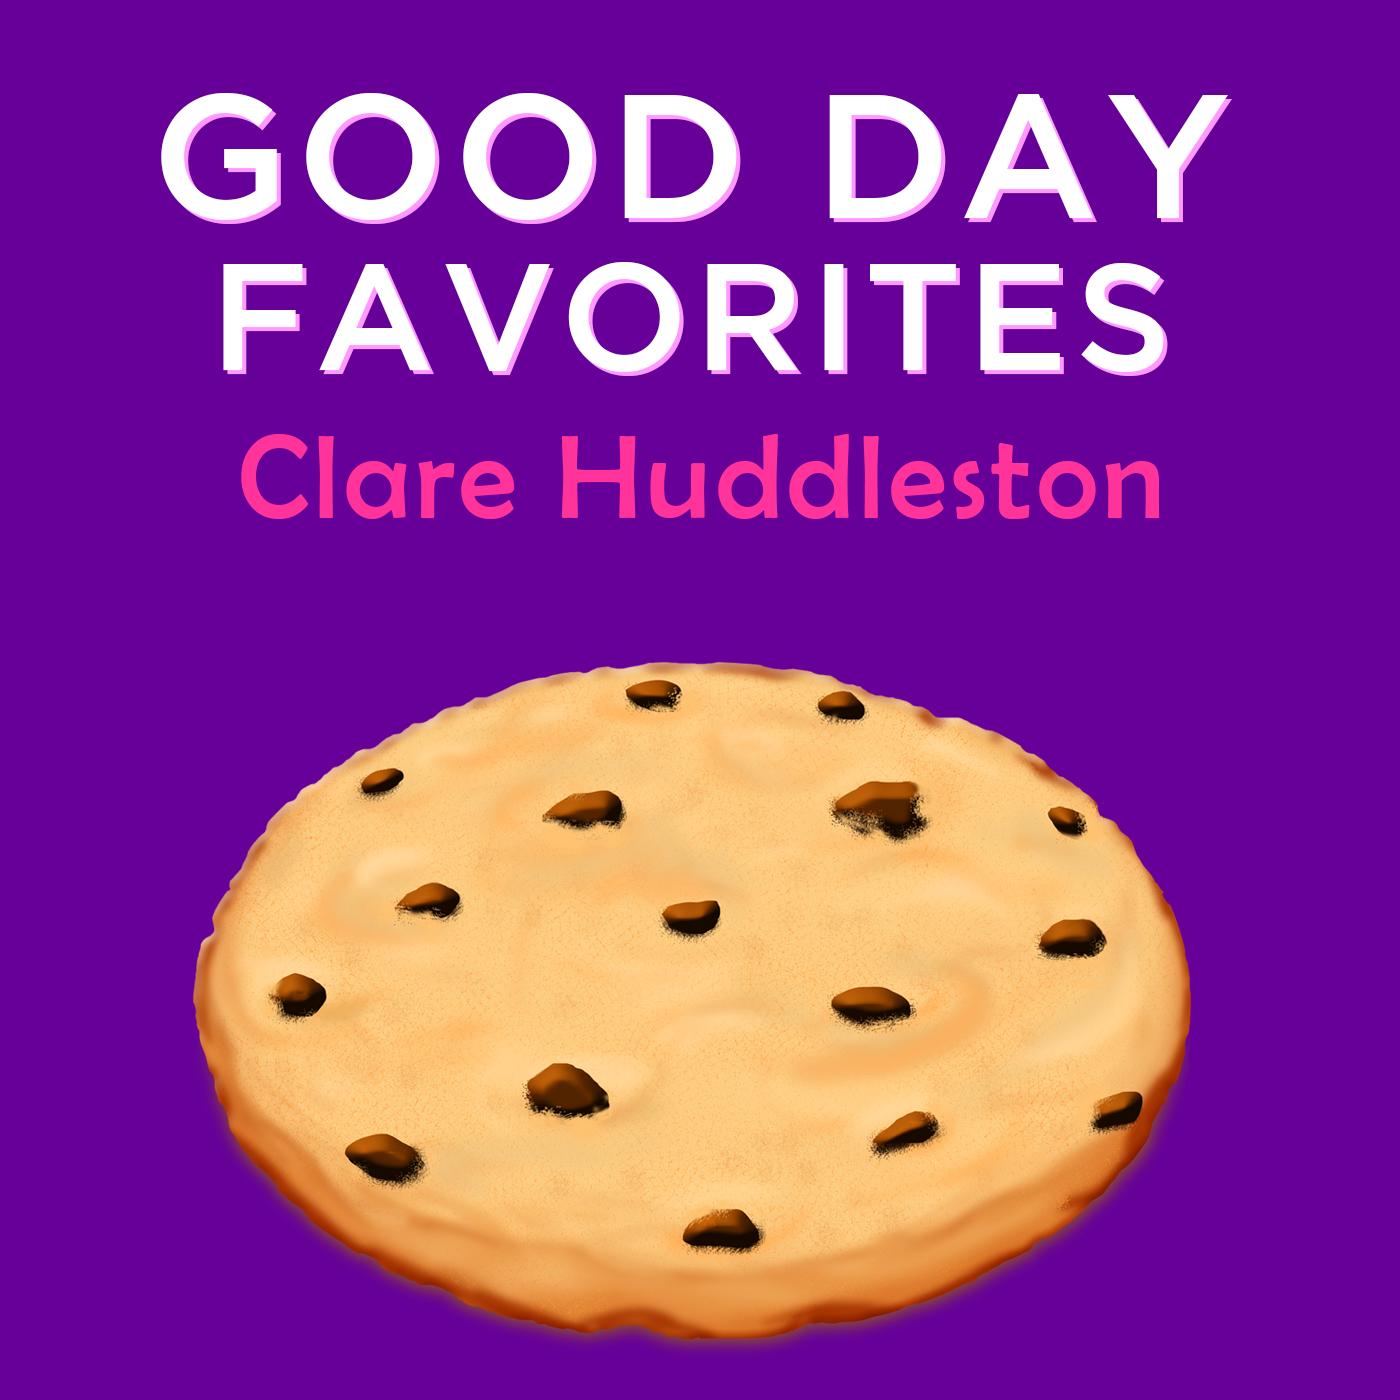 GDA Cookbook Clare Huddleston Favorites